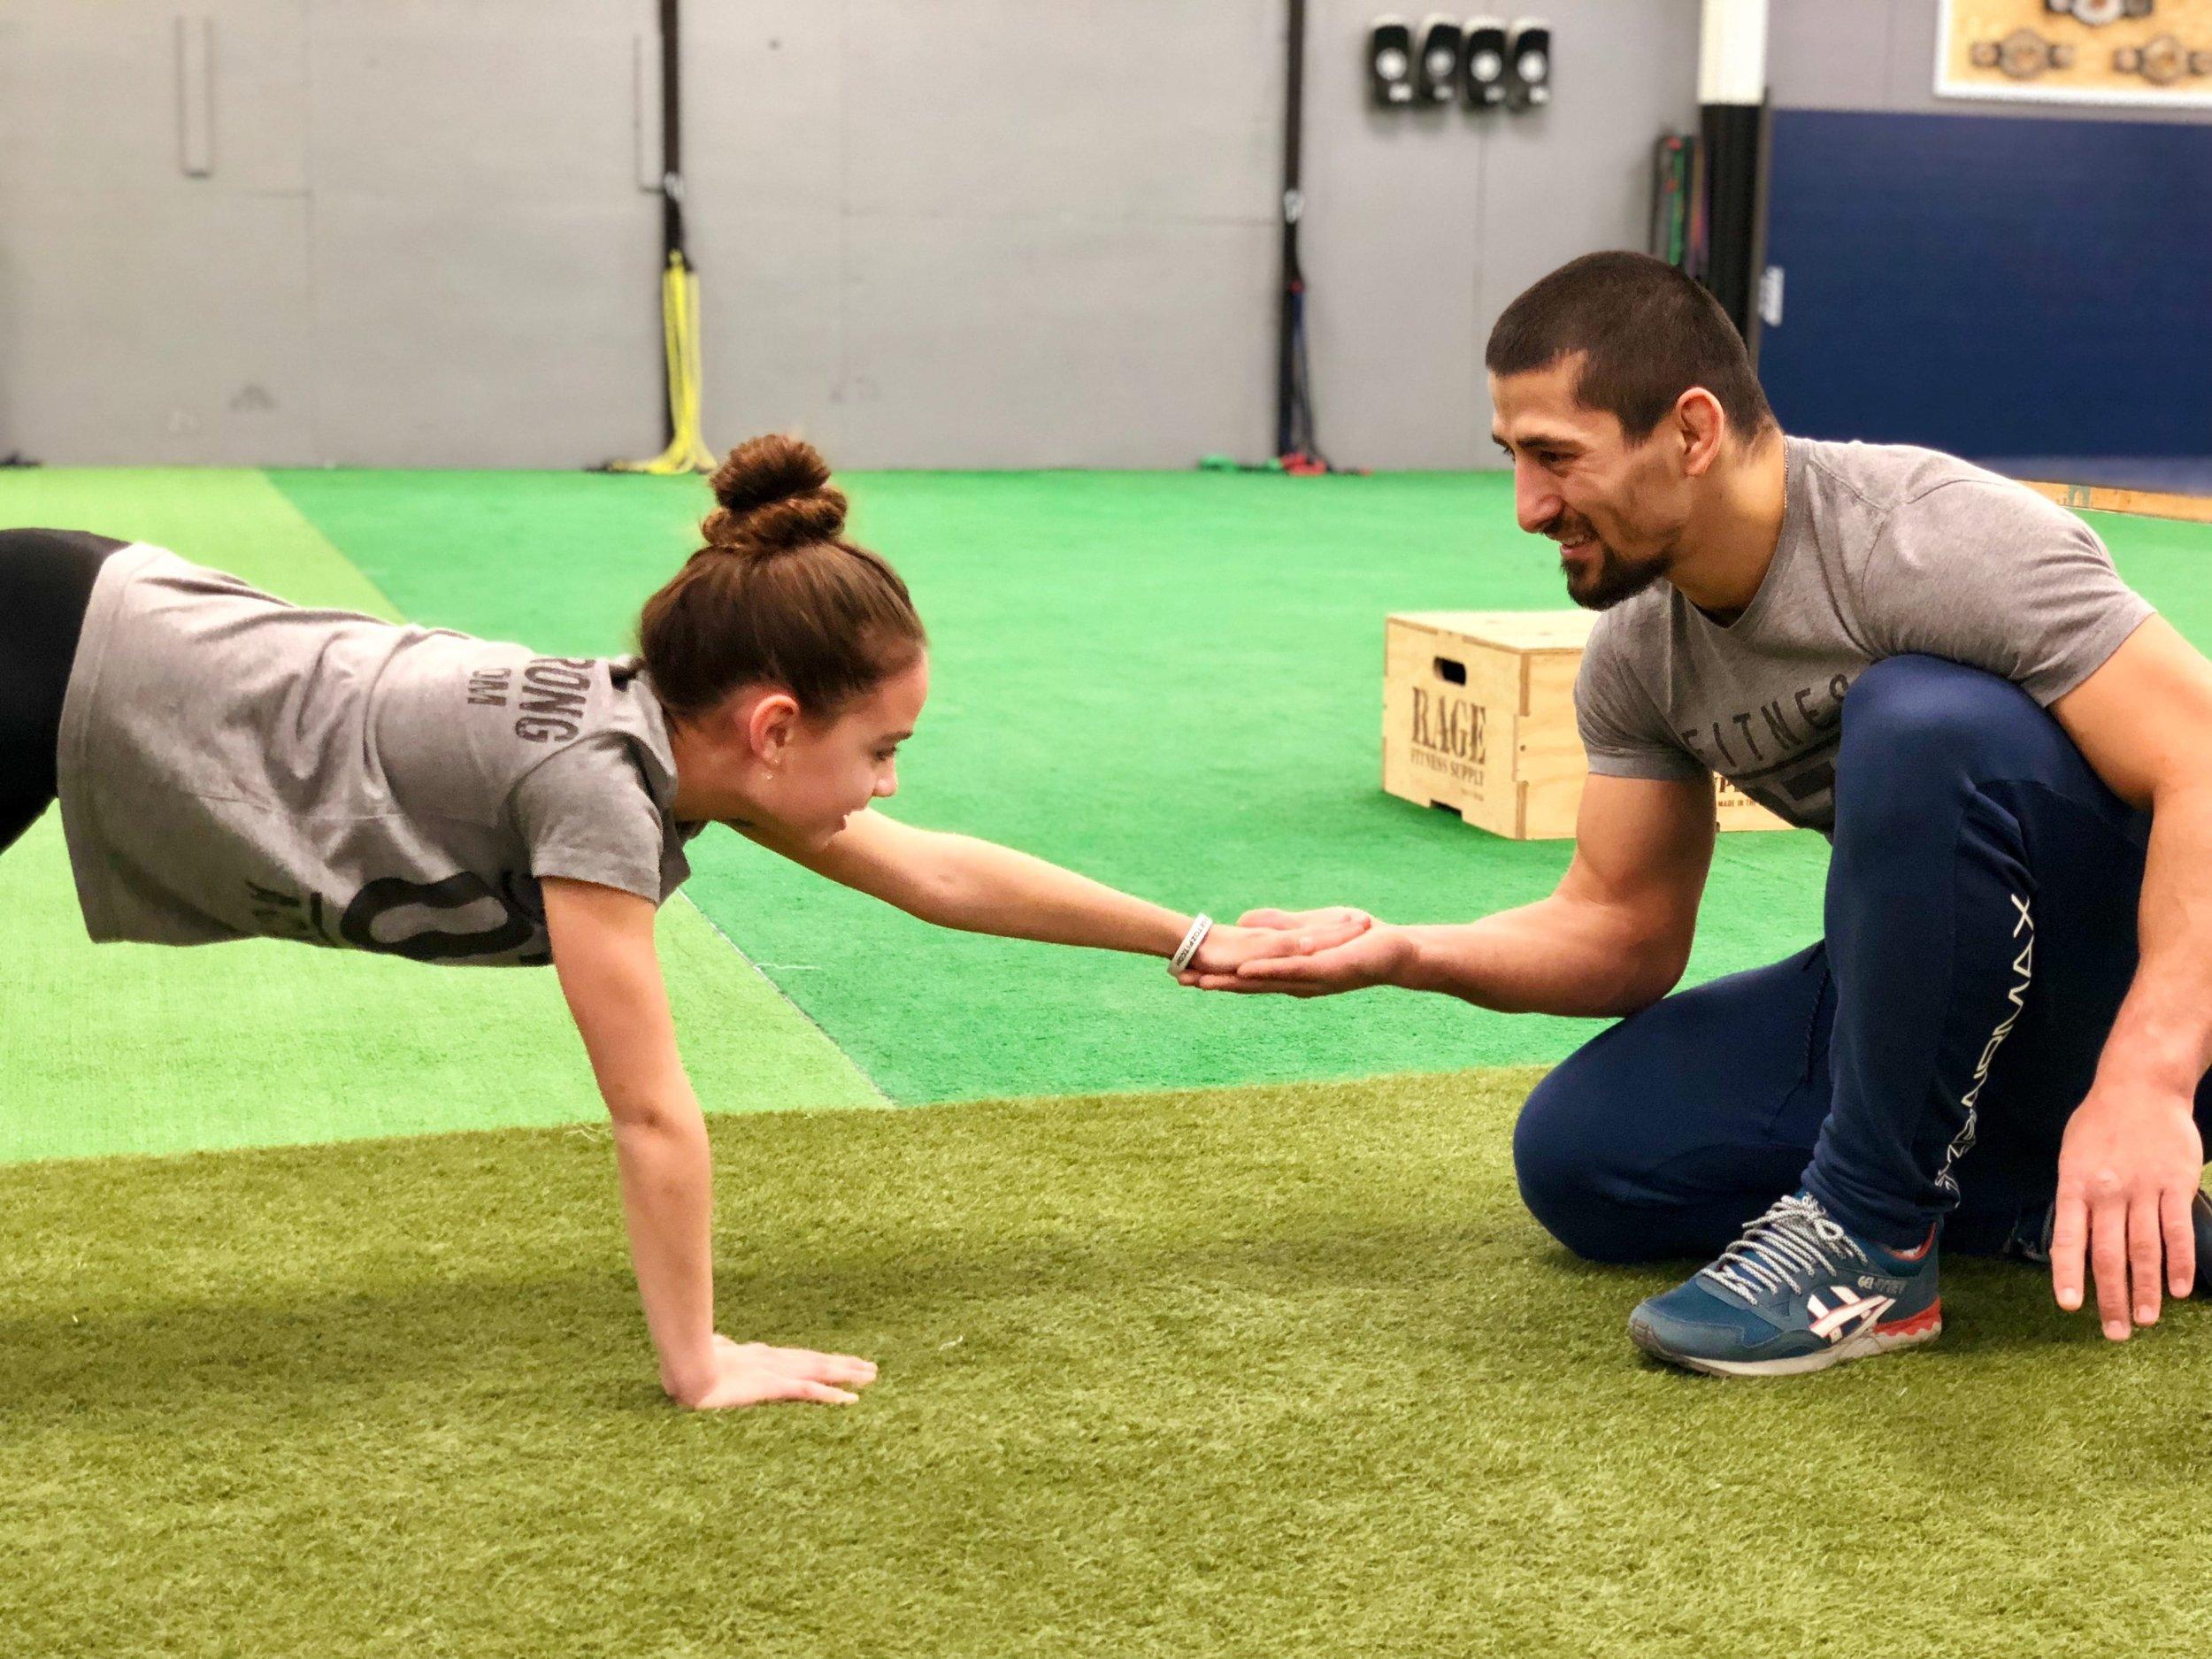 Get Oz Fit - Personal Trainer in Bergen County New Jersey - Ozzy Dugulubgov - Kids Training - Youth Fitness Program NJ (3)-min.jpeg